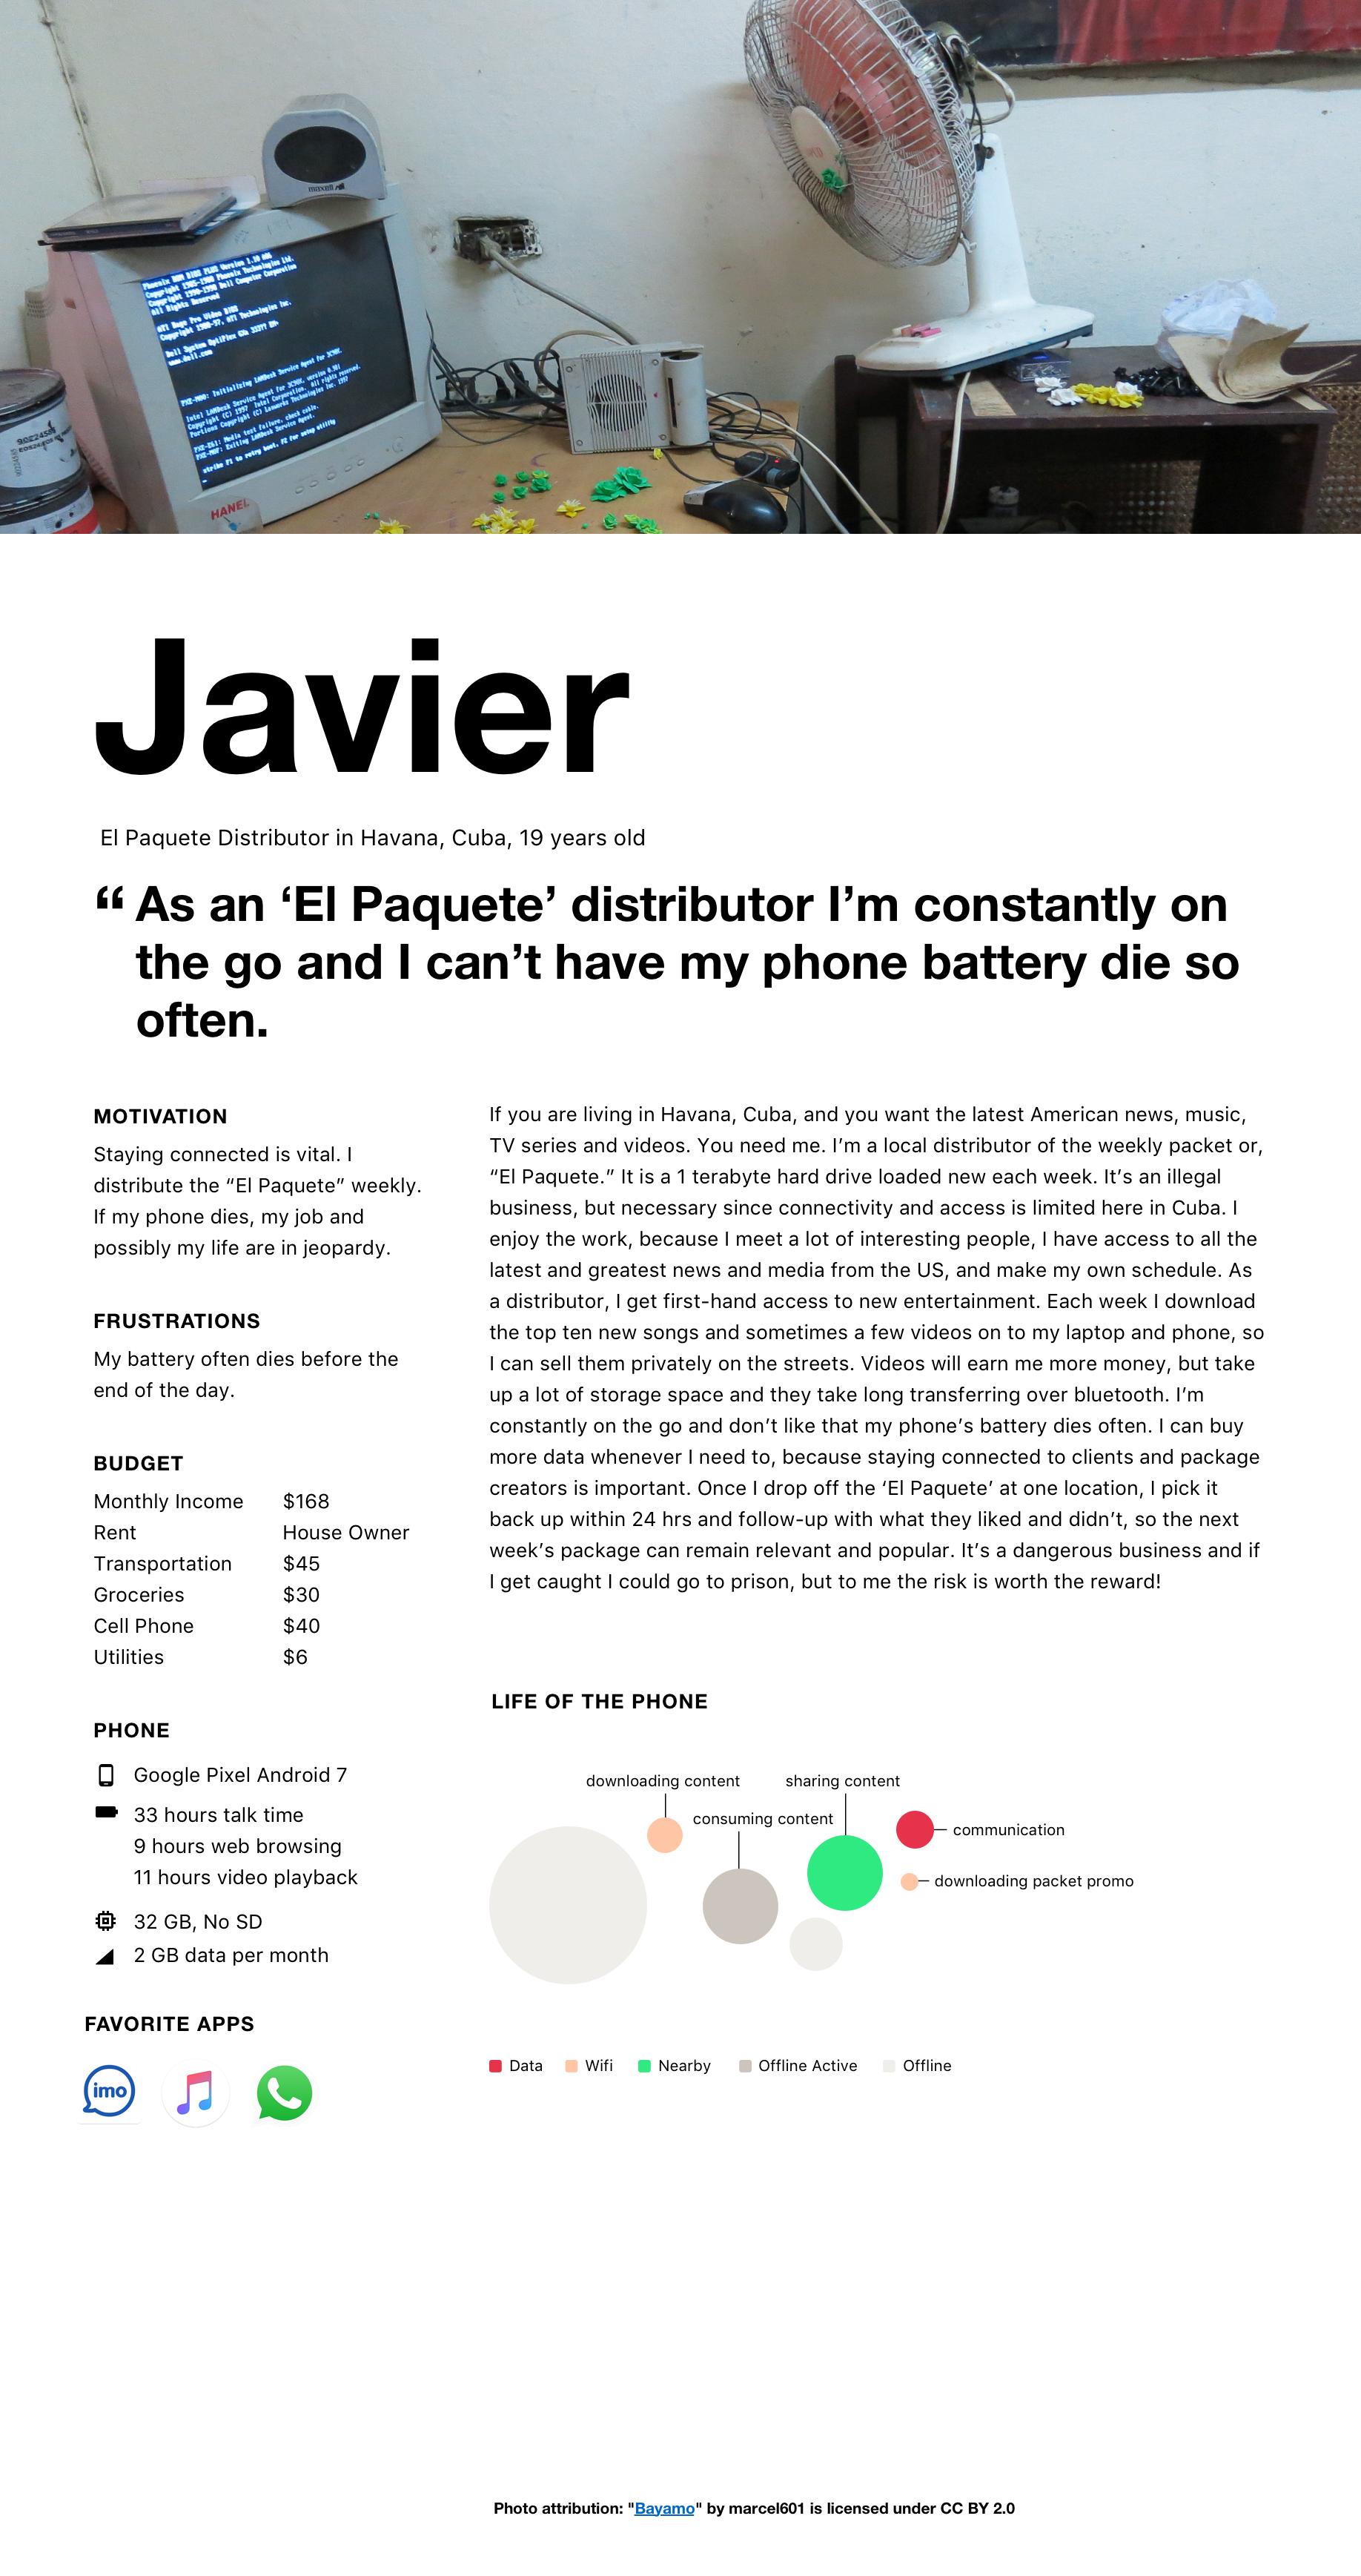 ux-persona-cuba-Javier@3x.png